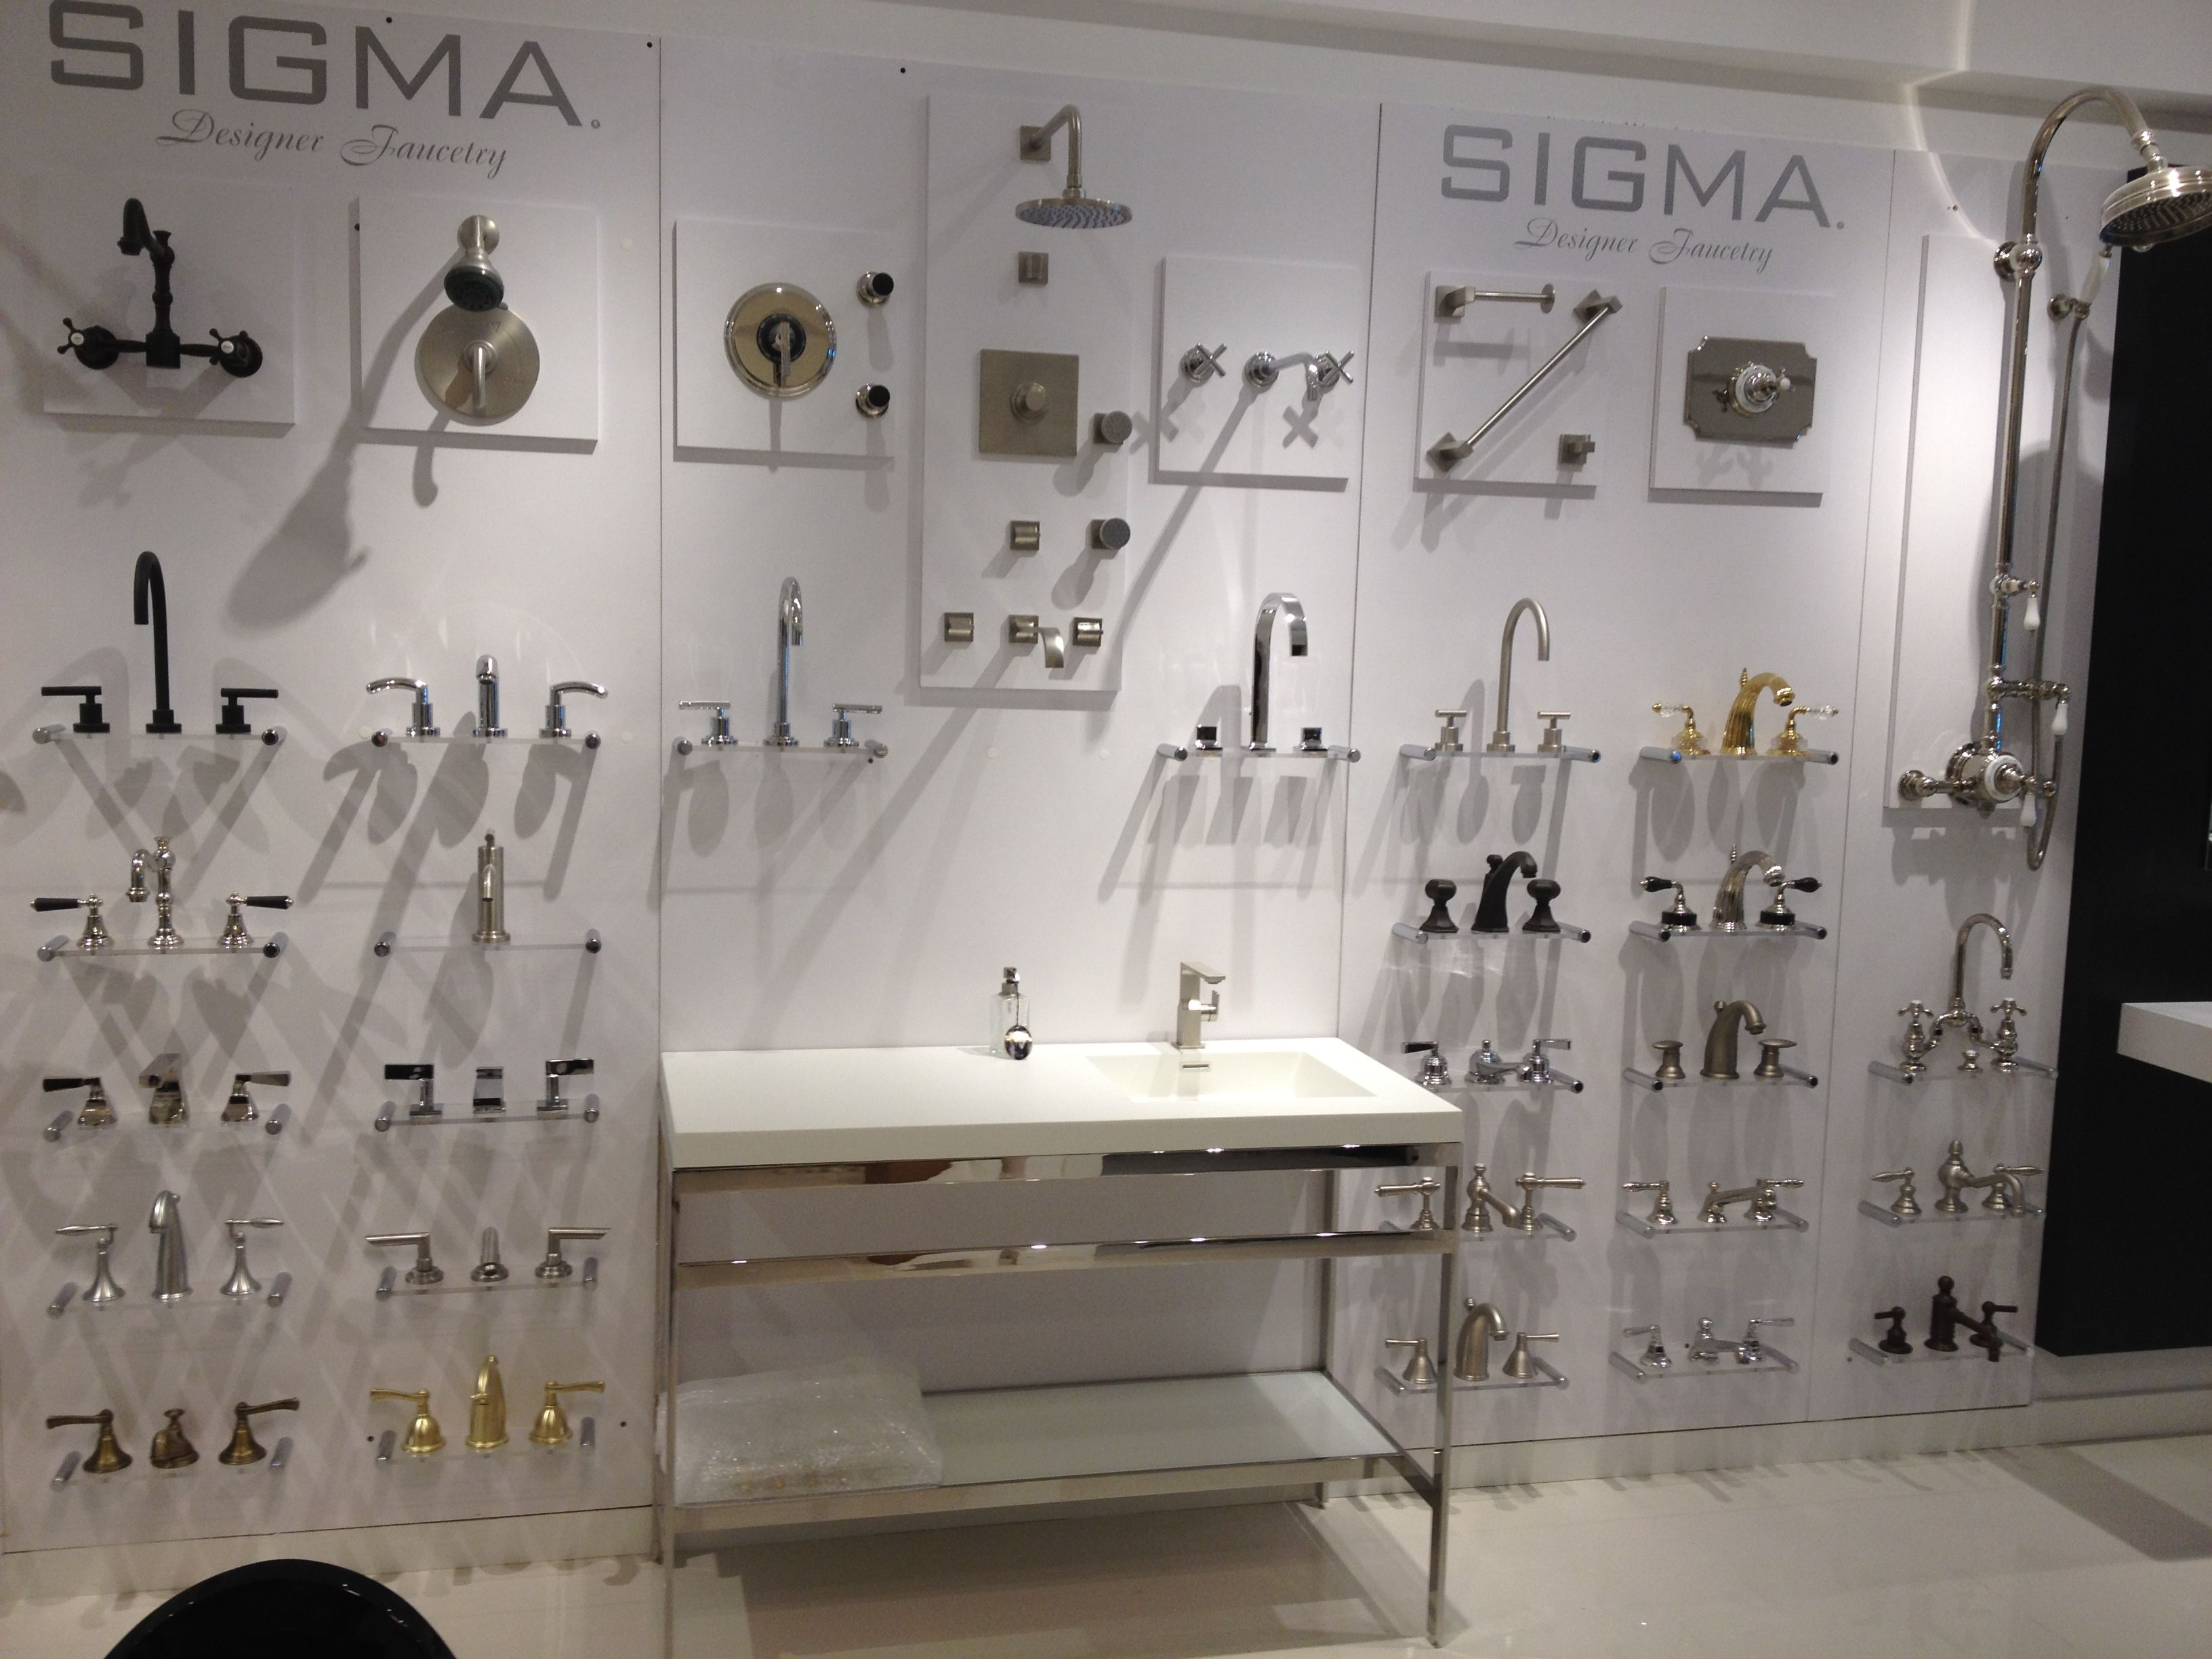 Sigma Display Wetstyle Vanity At Our New Showroom In The Miami Design District 3612 Ne 2nd Avenue Tasarim Dekorasyon